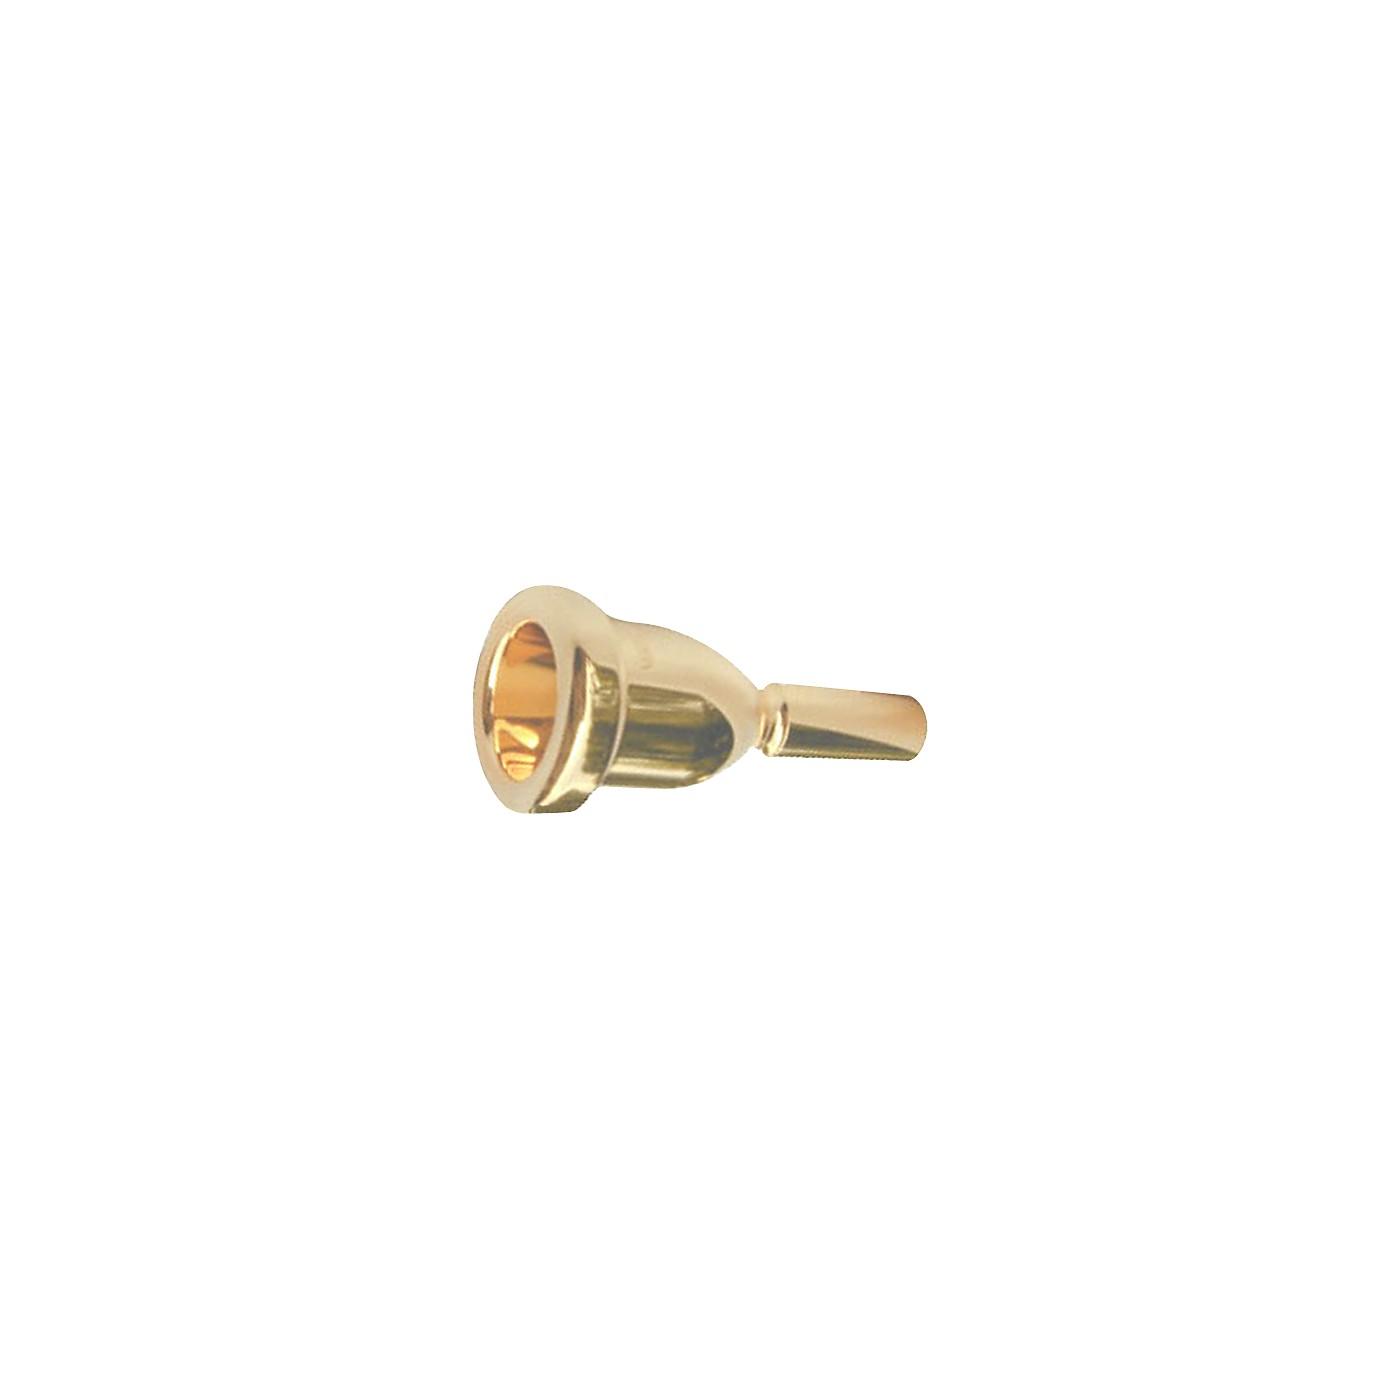 Bach Mega Tone Large Shank Trombone Mouthpiece in Gold thumbnail